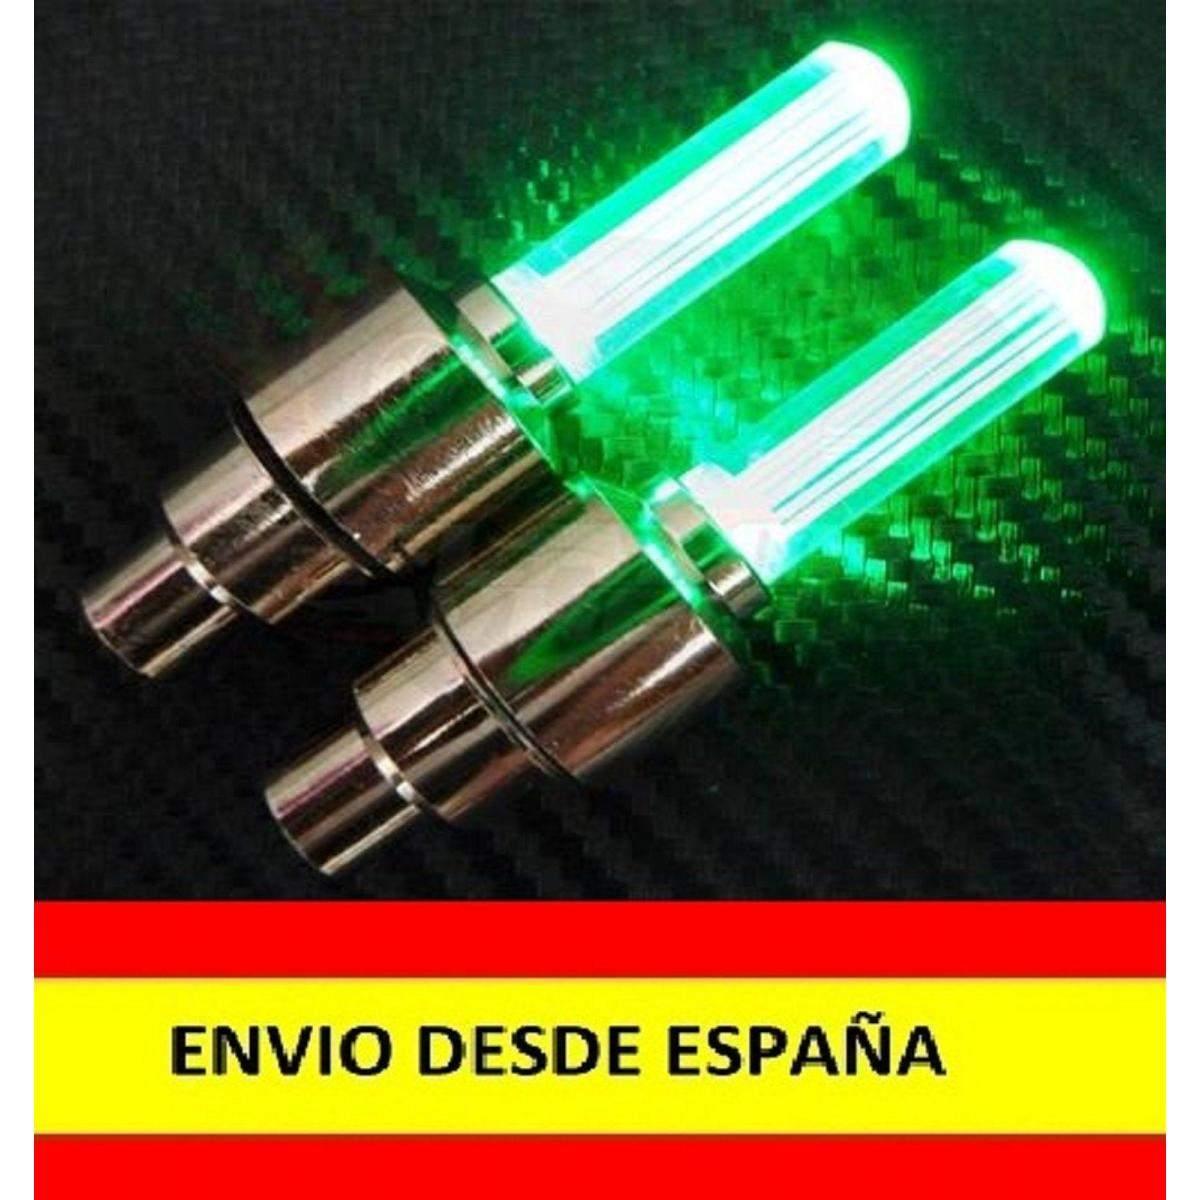 2x-Tapon-Luz-Led-para-valvula-Llanta-de-Rueda-Coche-Moto-Bici-Bicicleta-LUCES